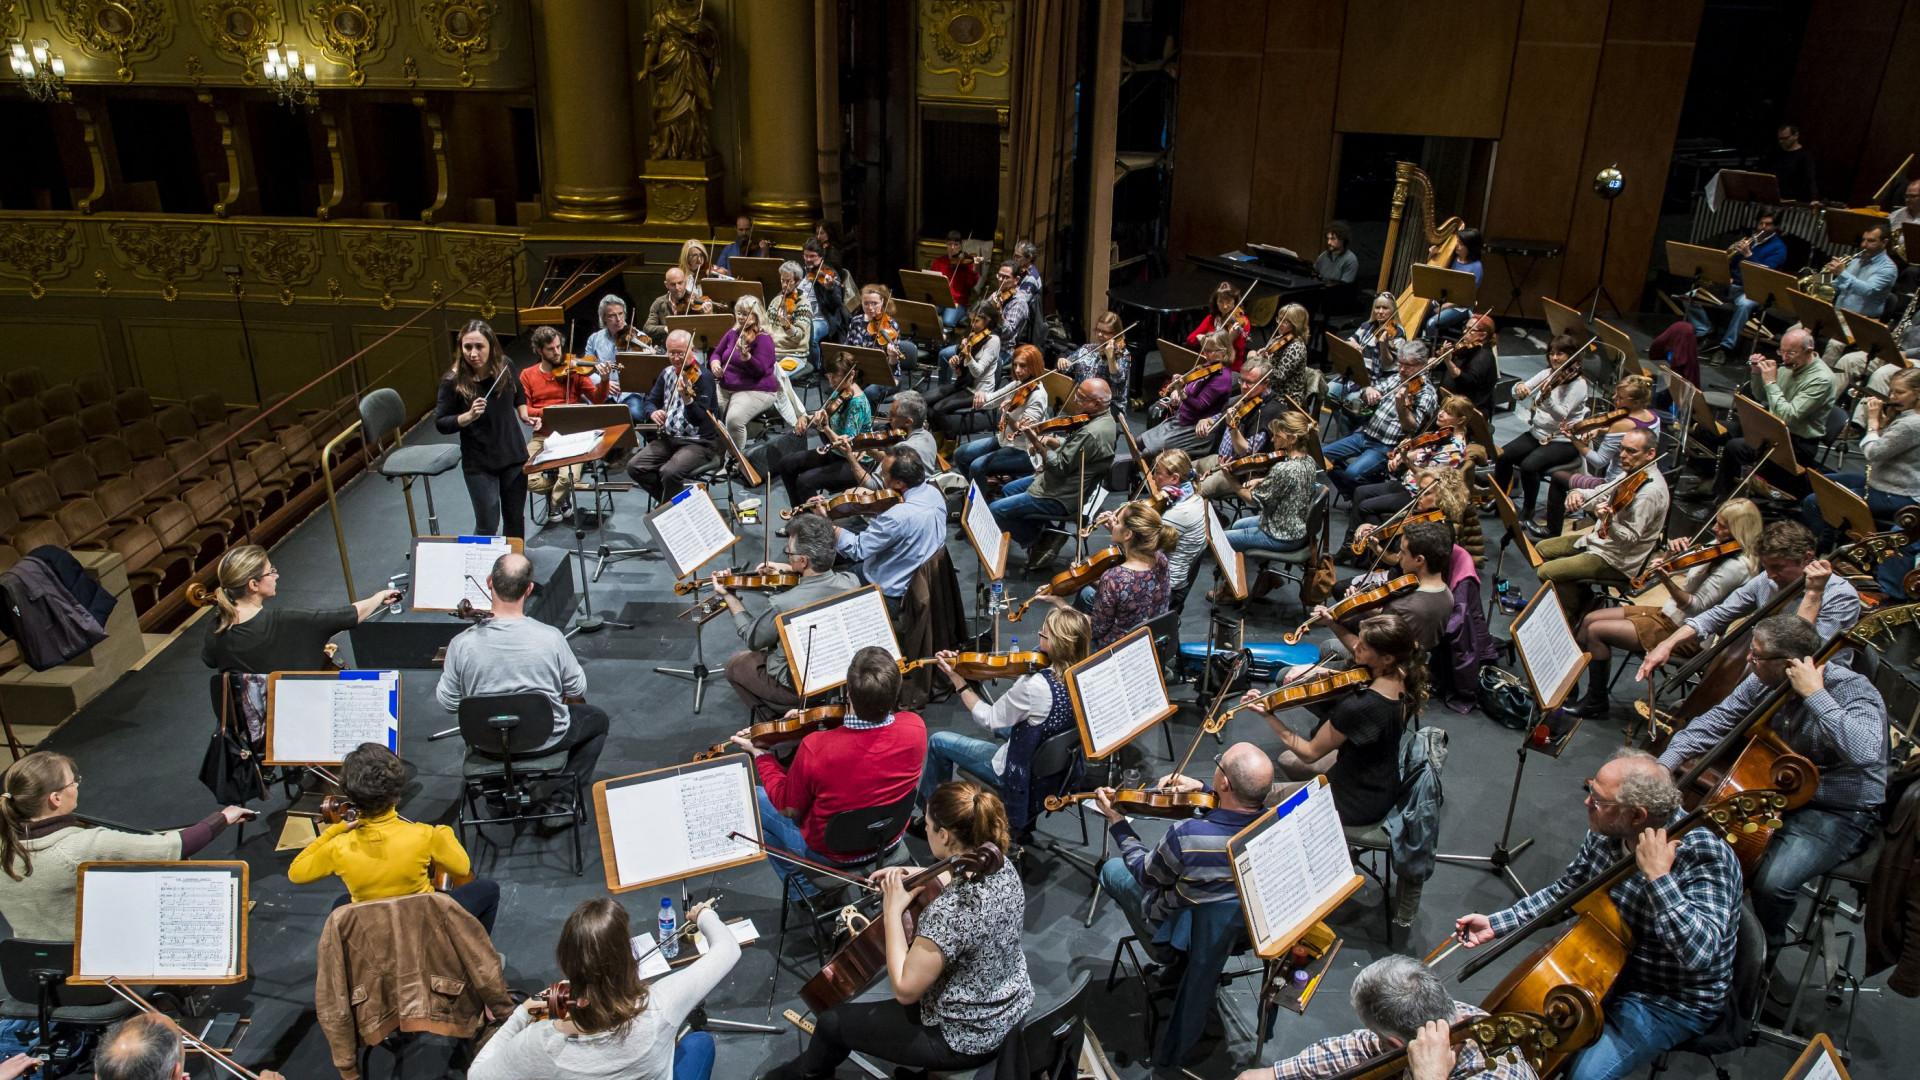 Orquestra Sinfónica Portuguesa estreia obras de Luís Tinoco e Ana Seara